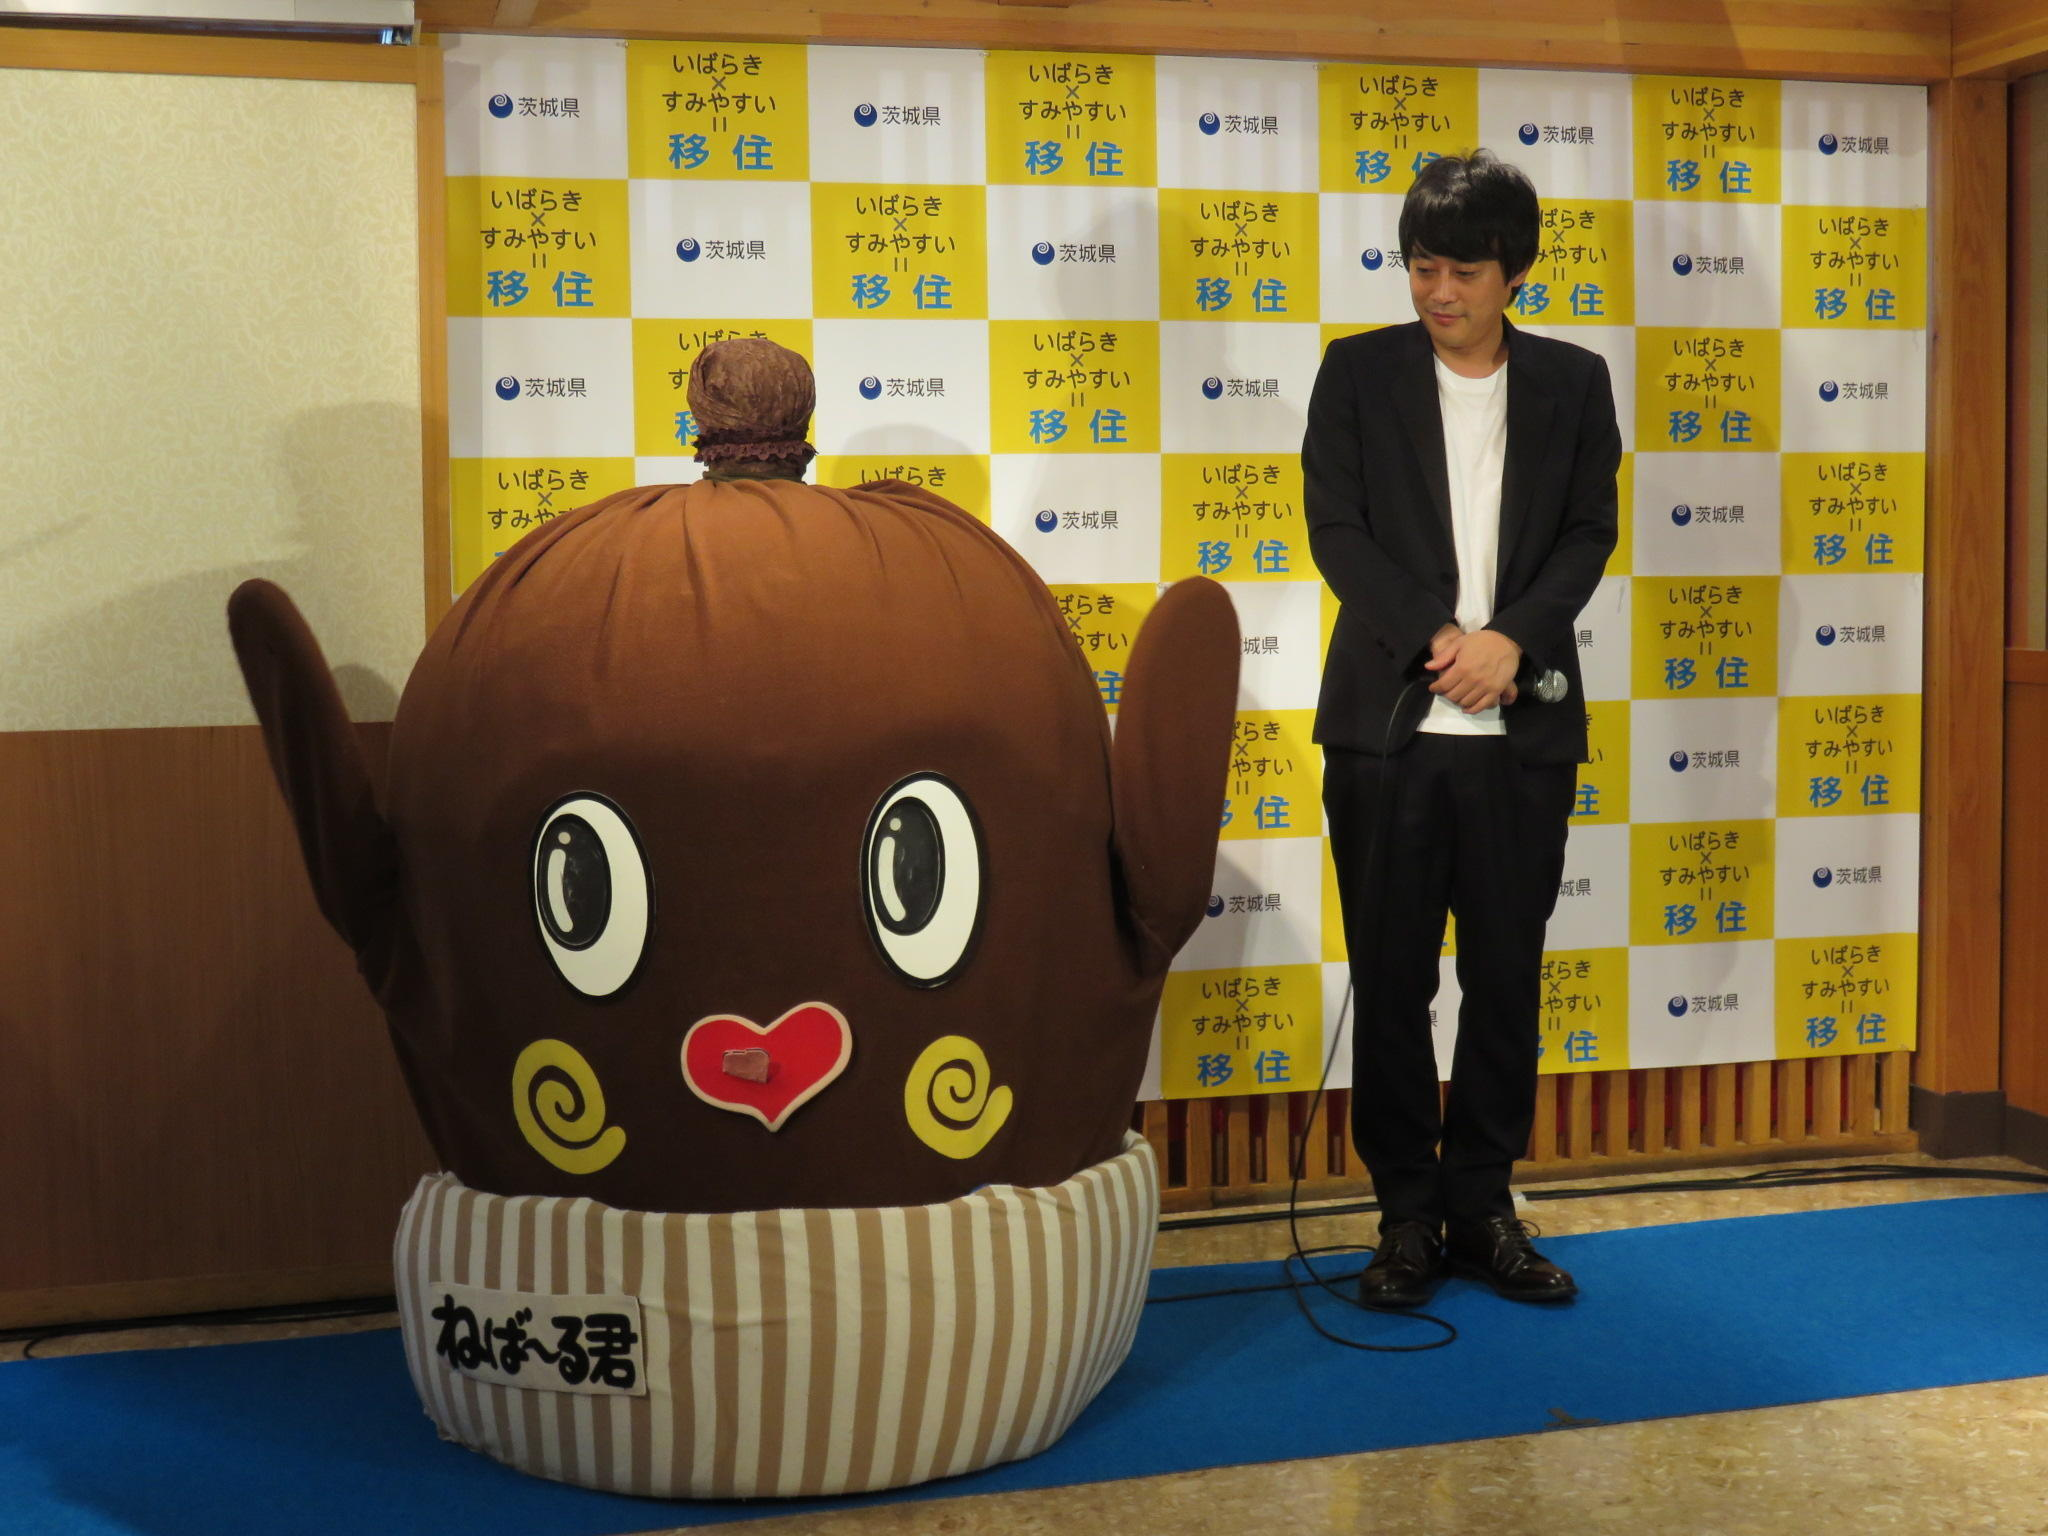 http://news.yoshimoto.co.jp/20160630165225-28df4fd9413fbec1d86304b67ca5439a67a9b88e.jpg